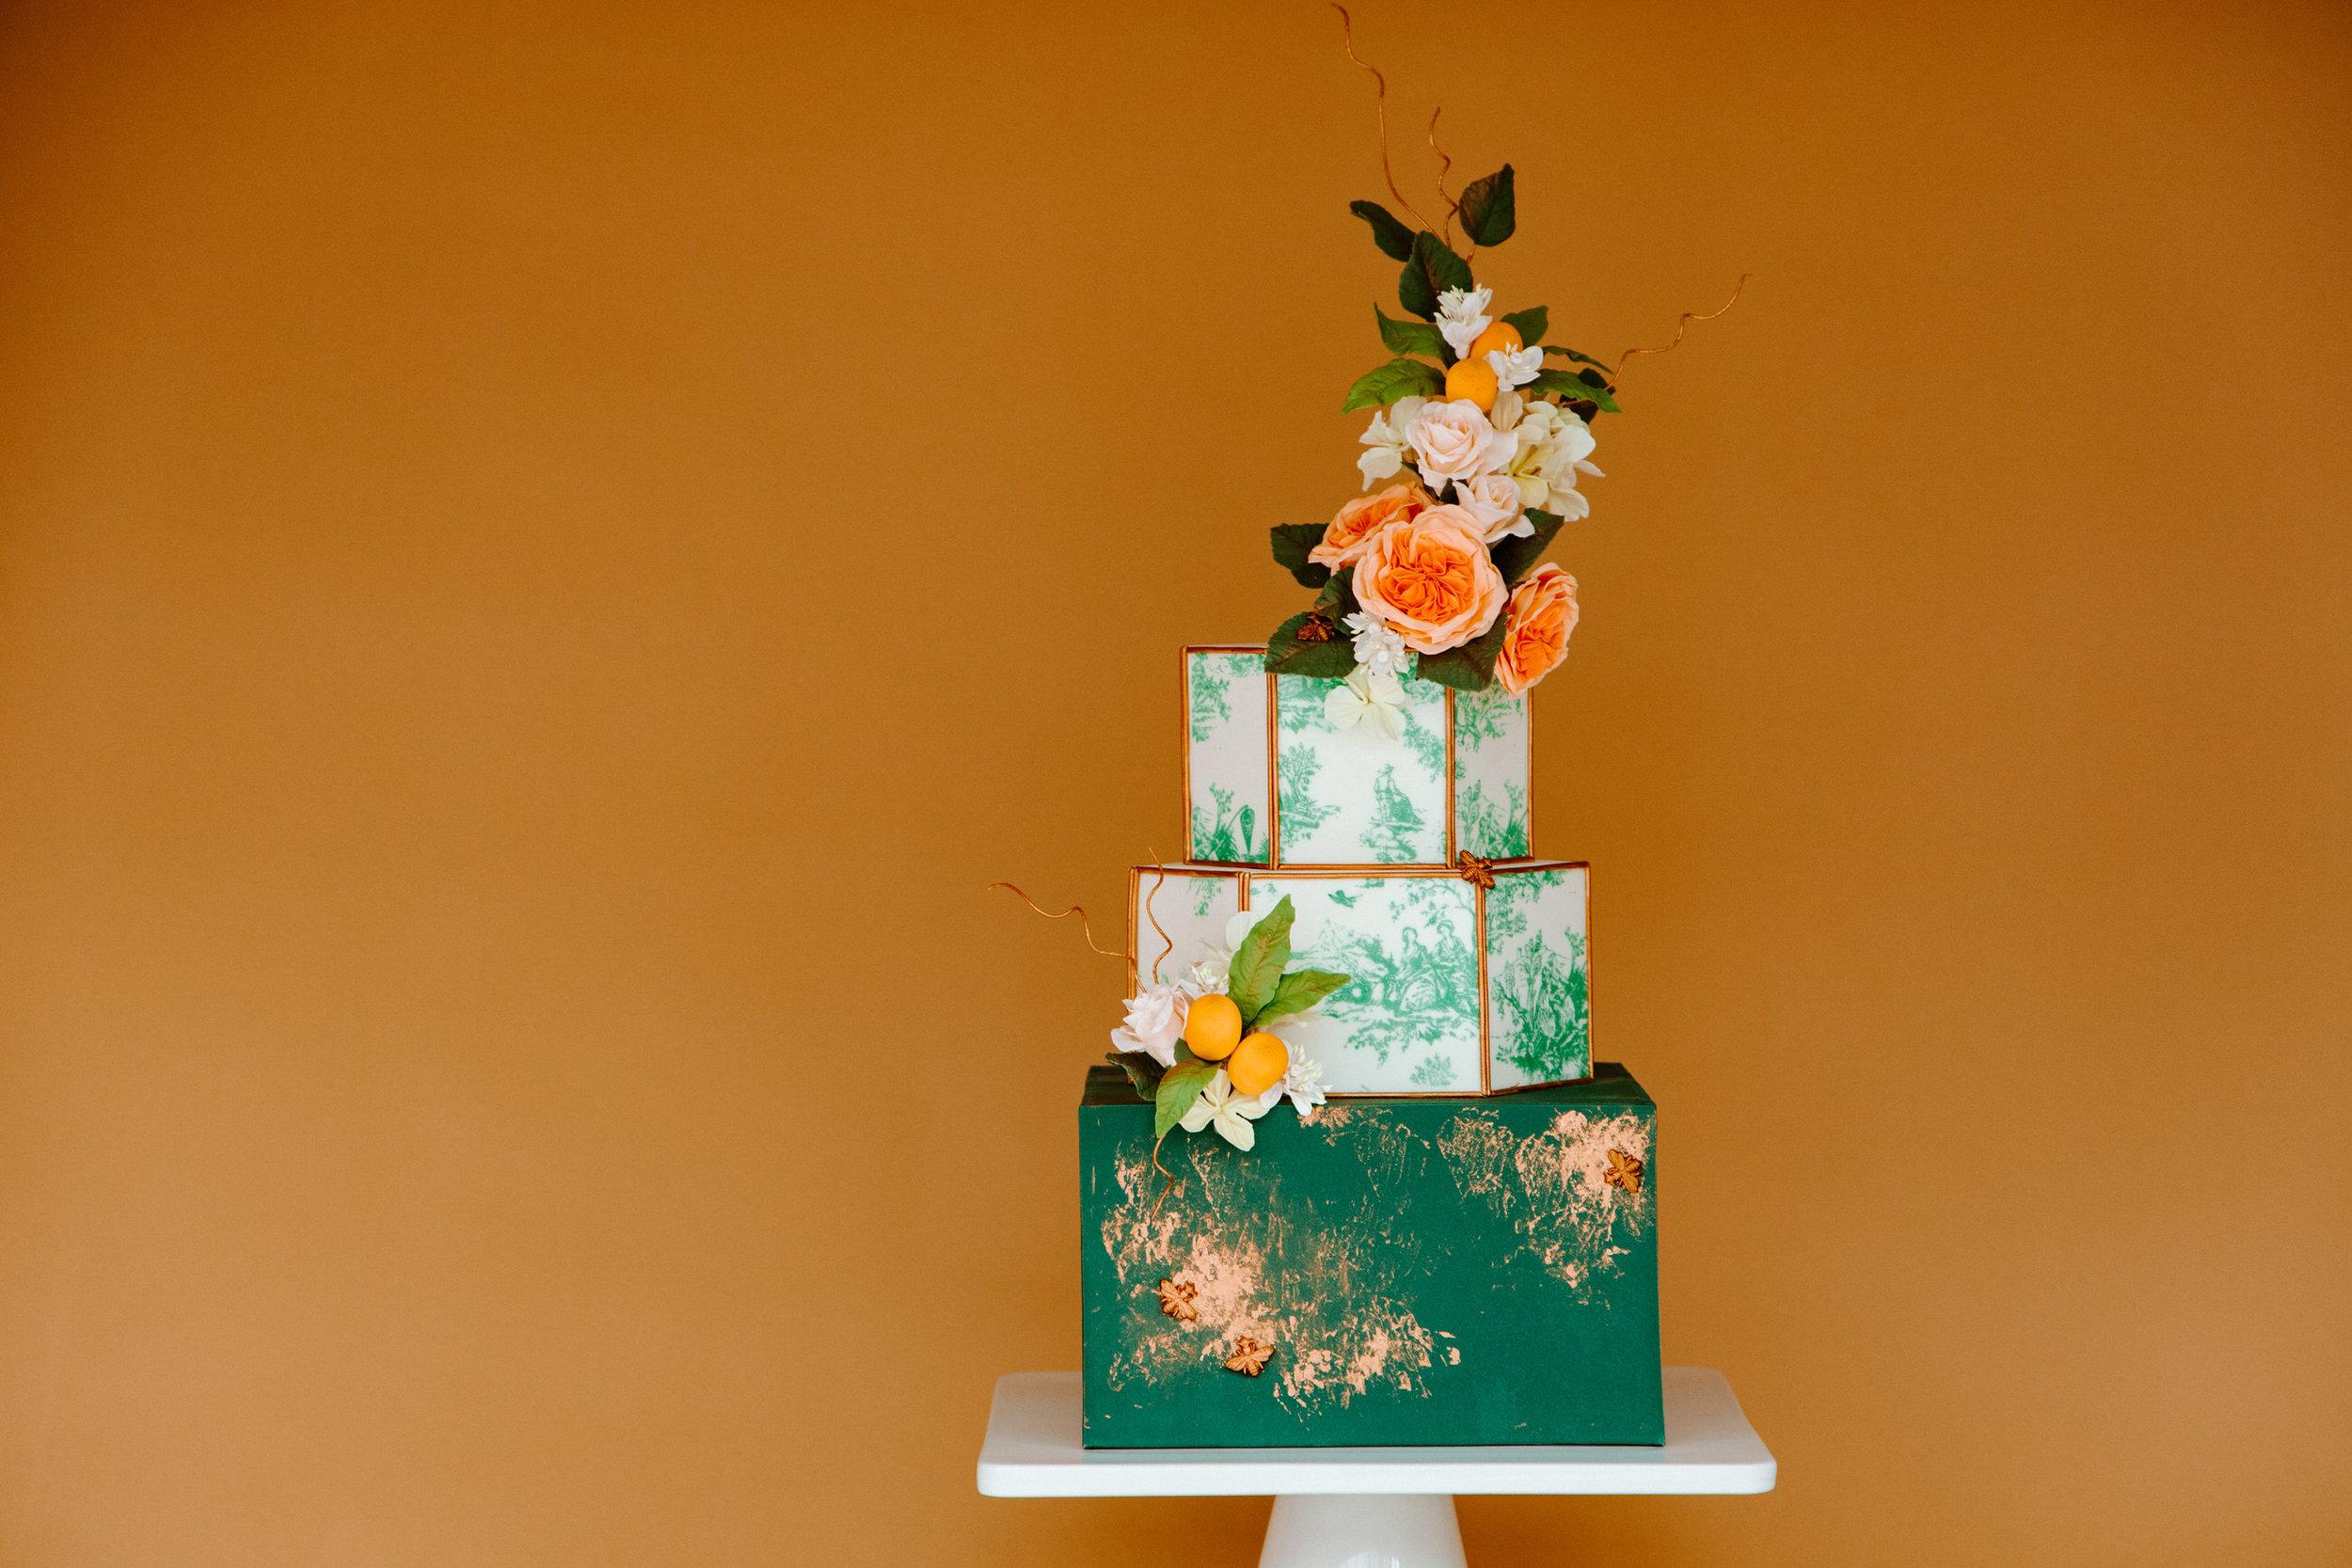 gateaux-cake-7385.jpg